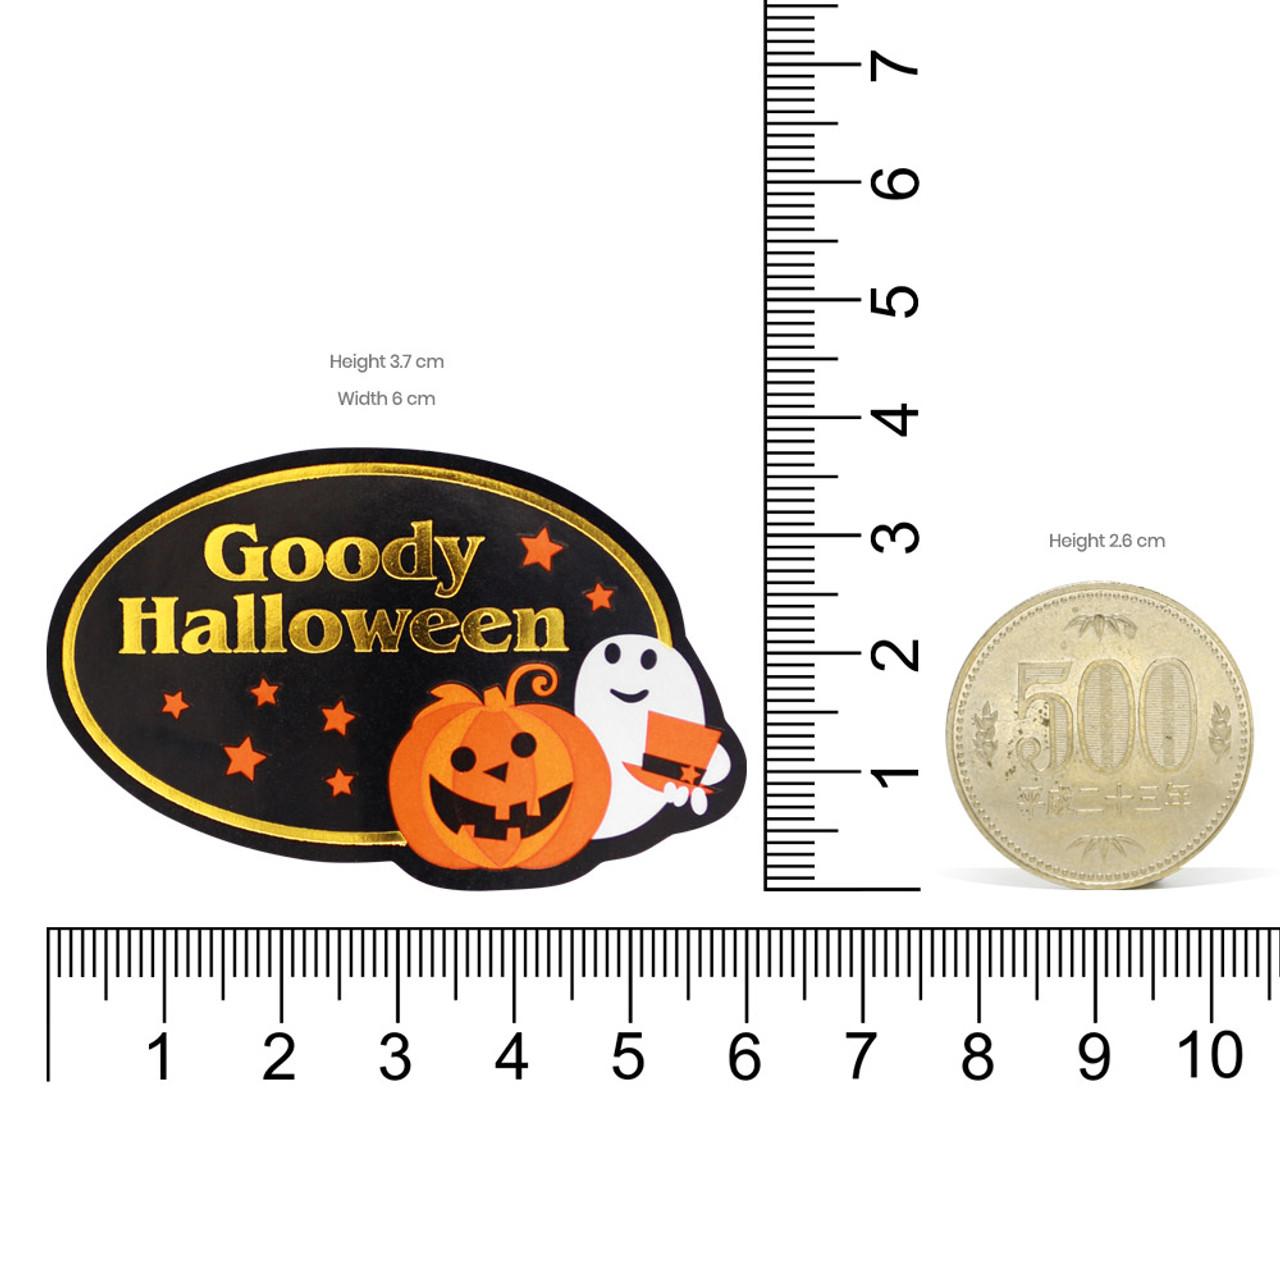 Kawaii Goody Halloween Hot Foil Stamping Sticker 4 Sheet ( Proportion )